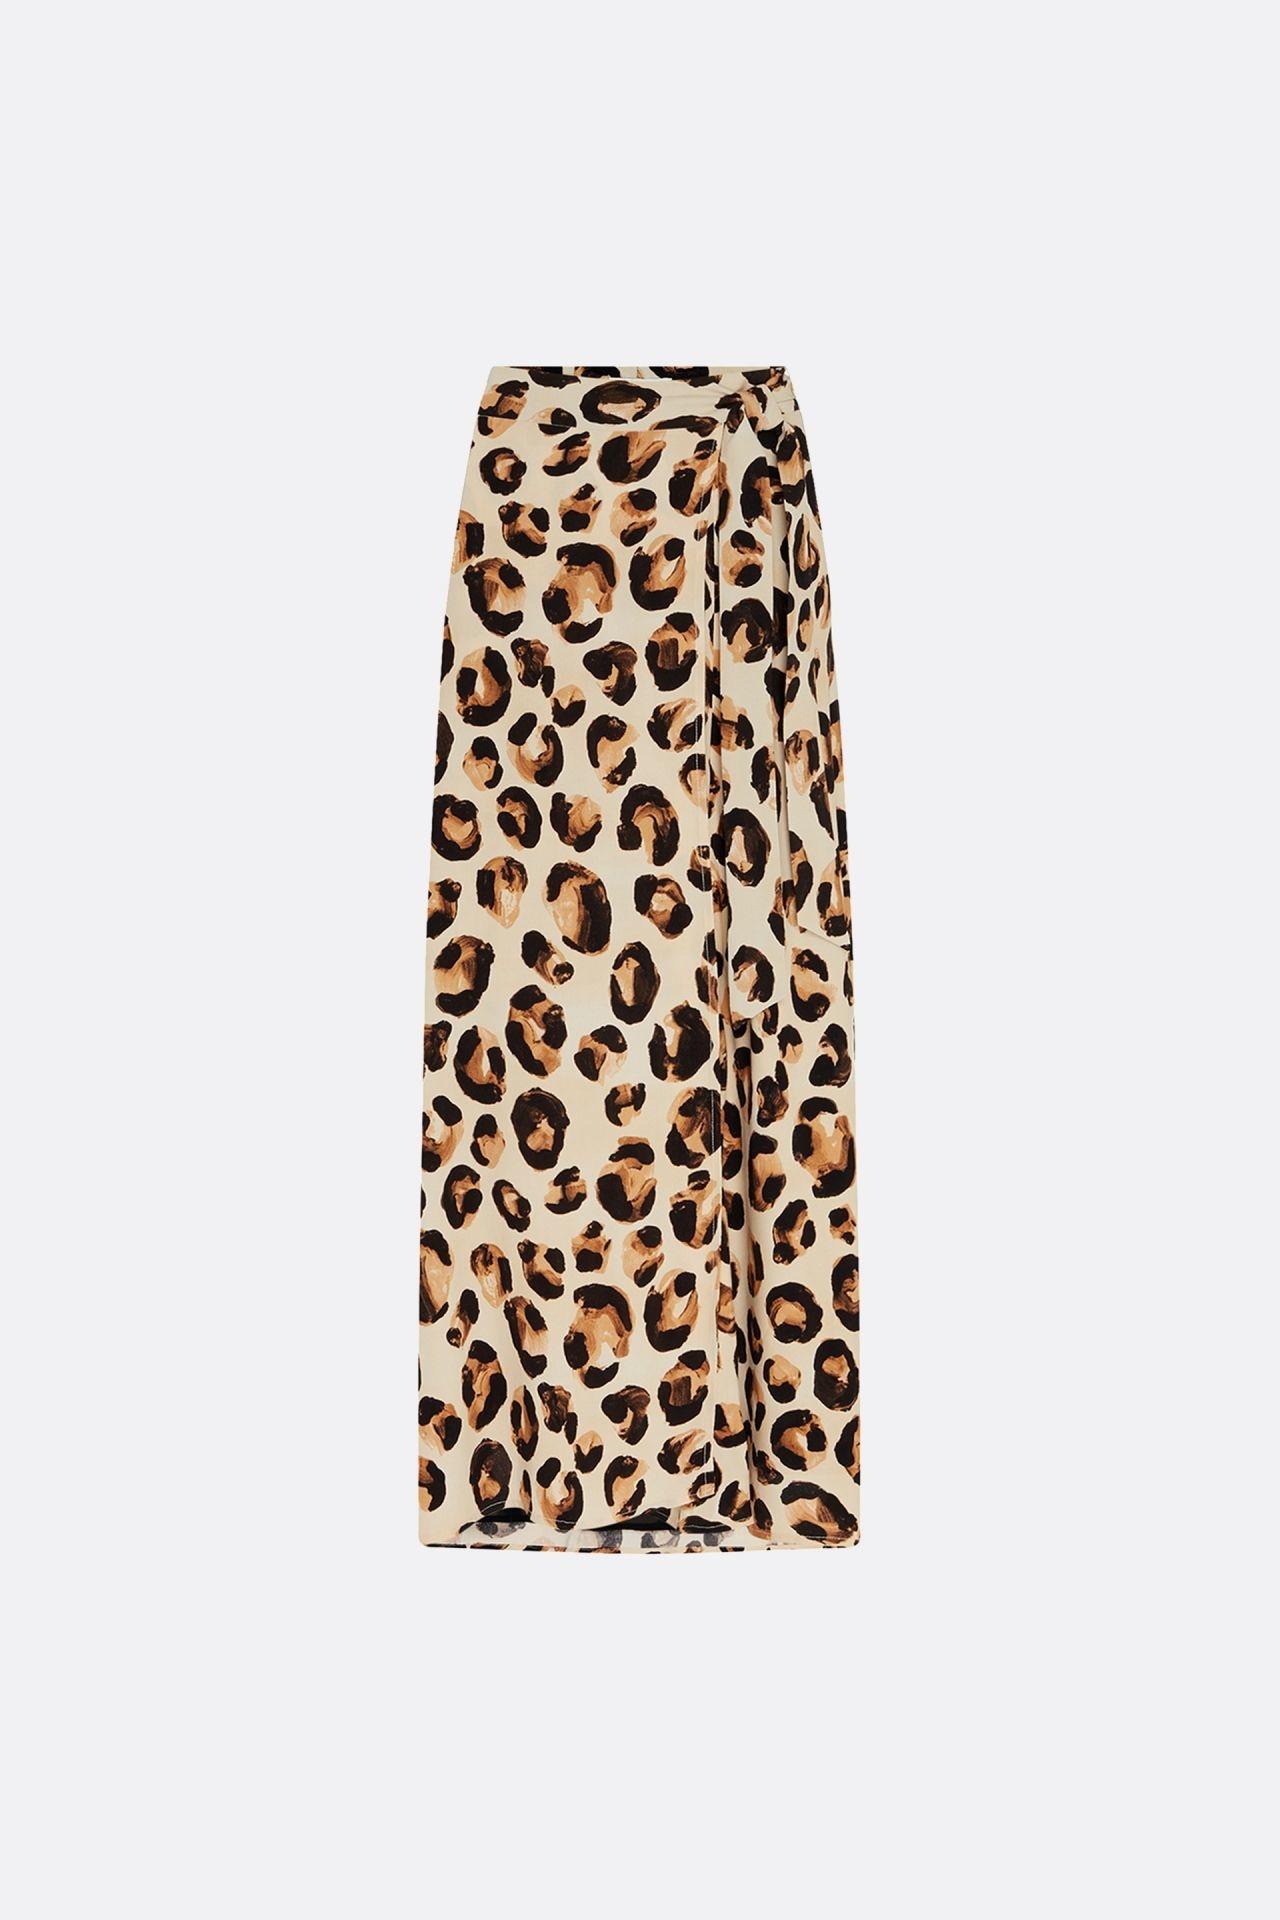 Fabienne Chapot skirt BOBO CLT-128-1